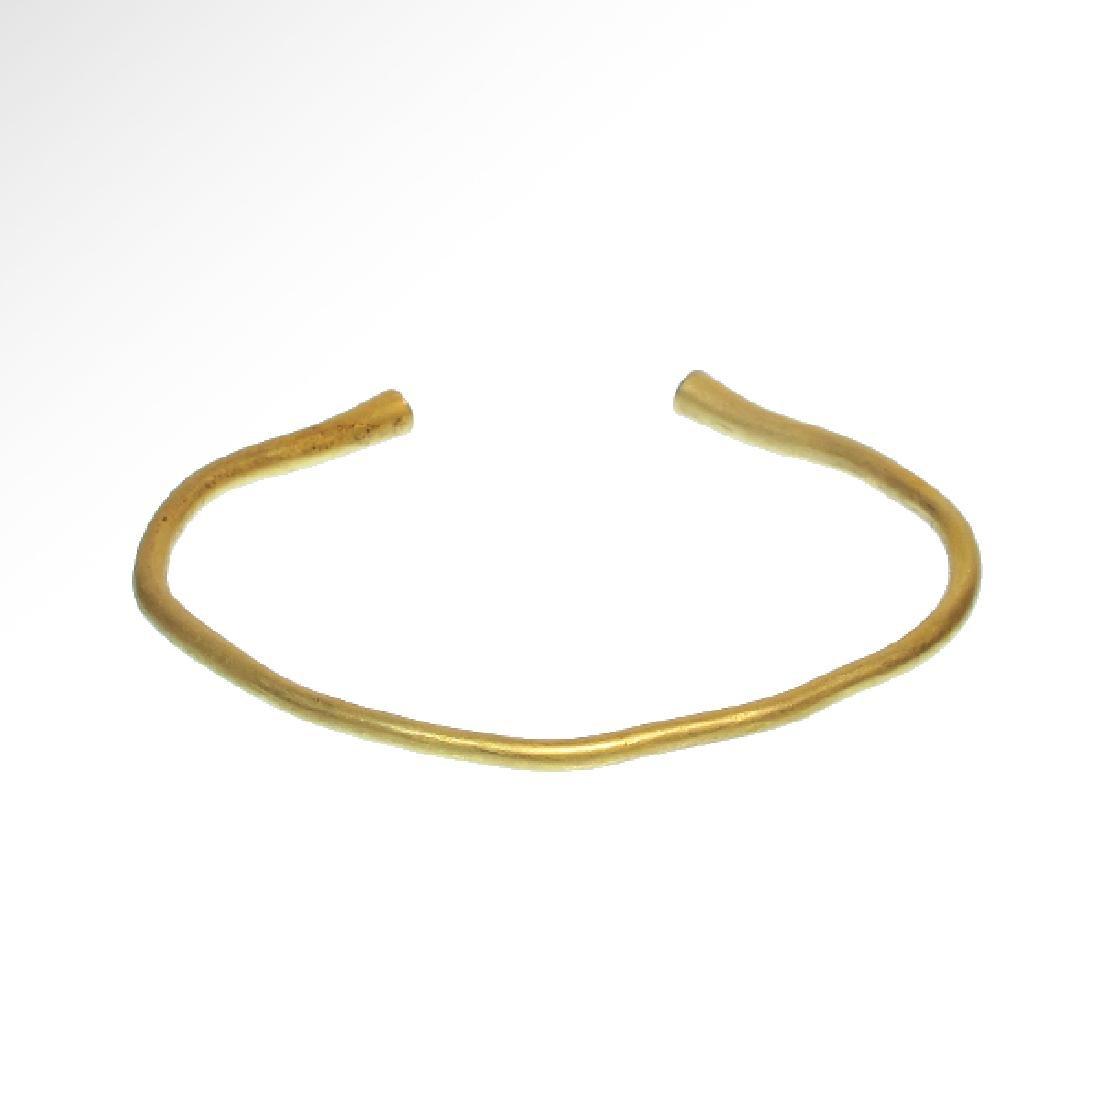 Greek Gold Bracelet, 5th-3rd Century B.C. - 2